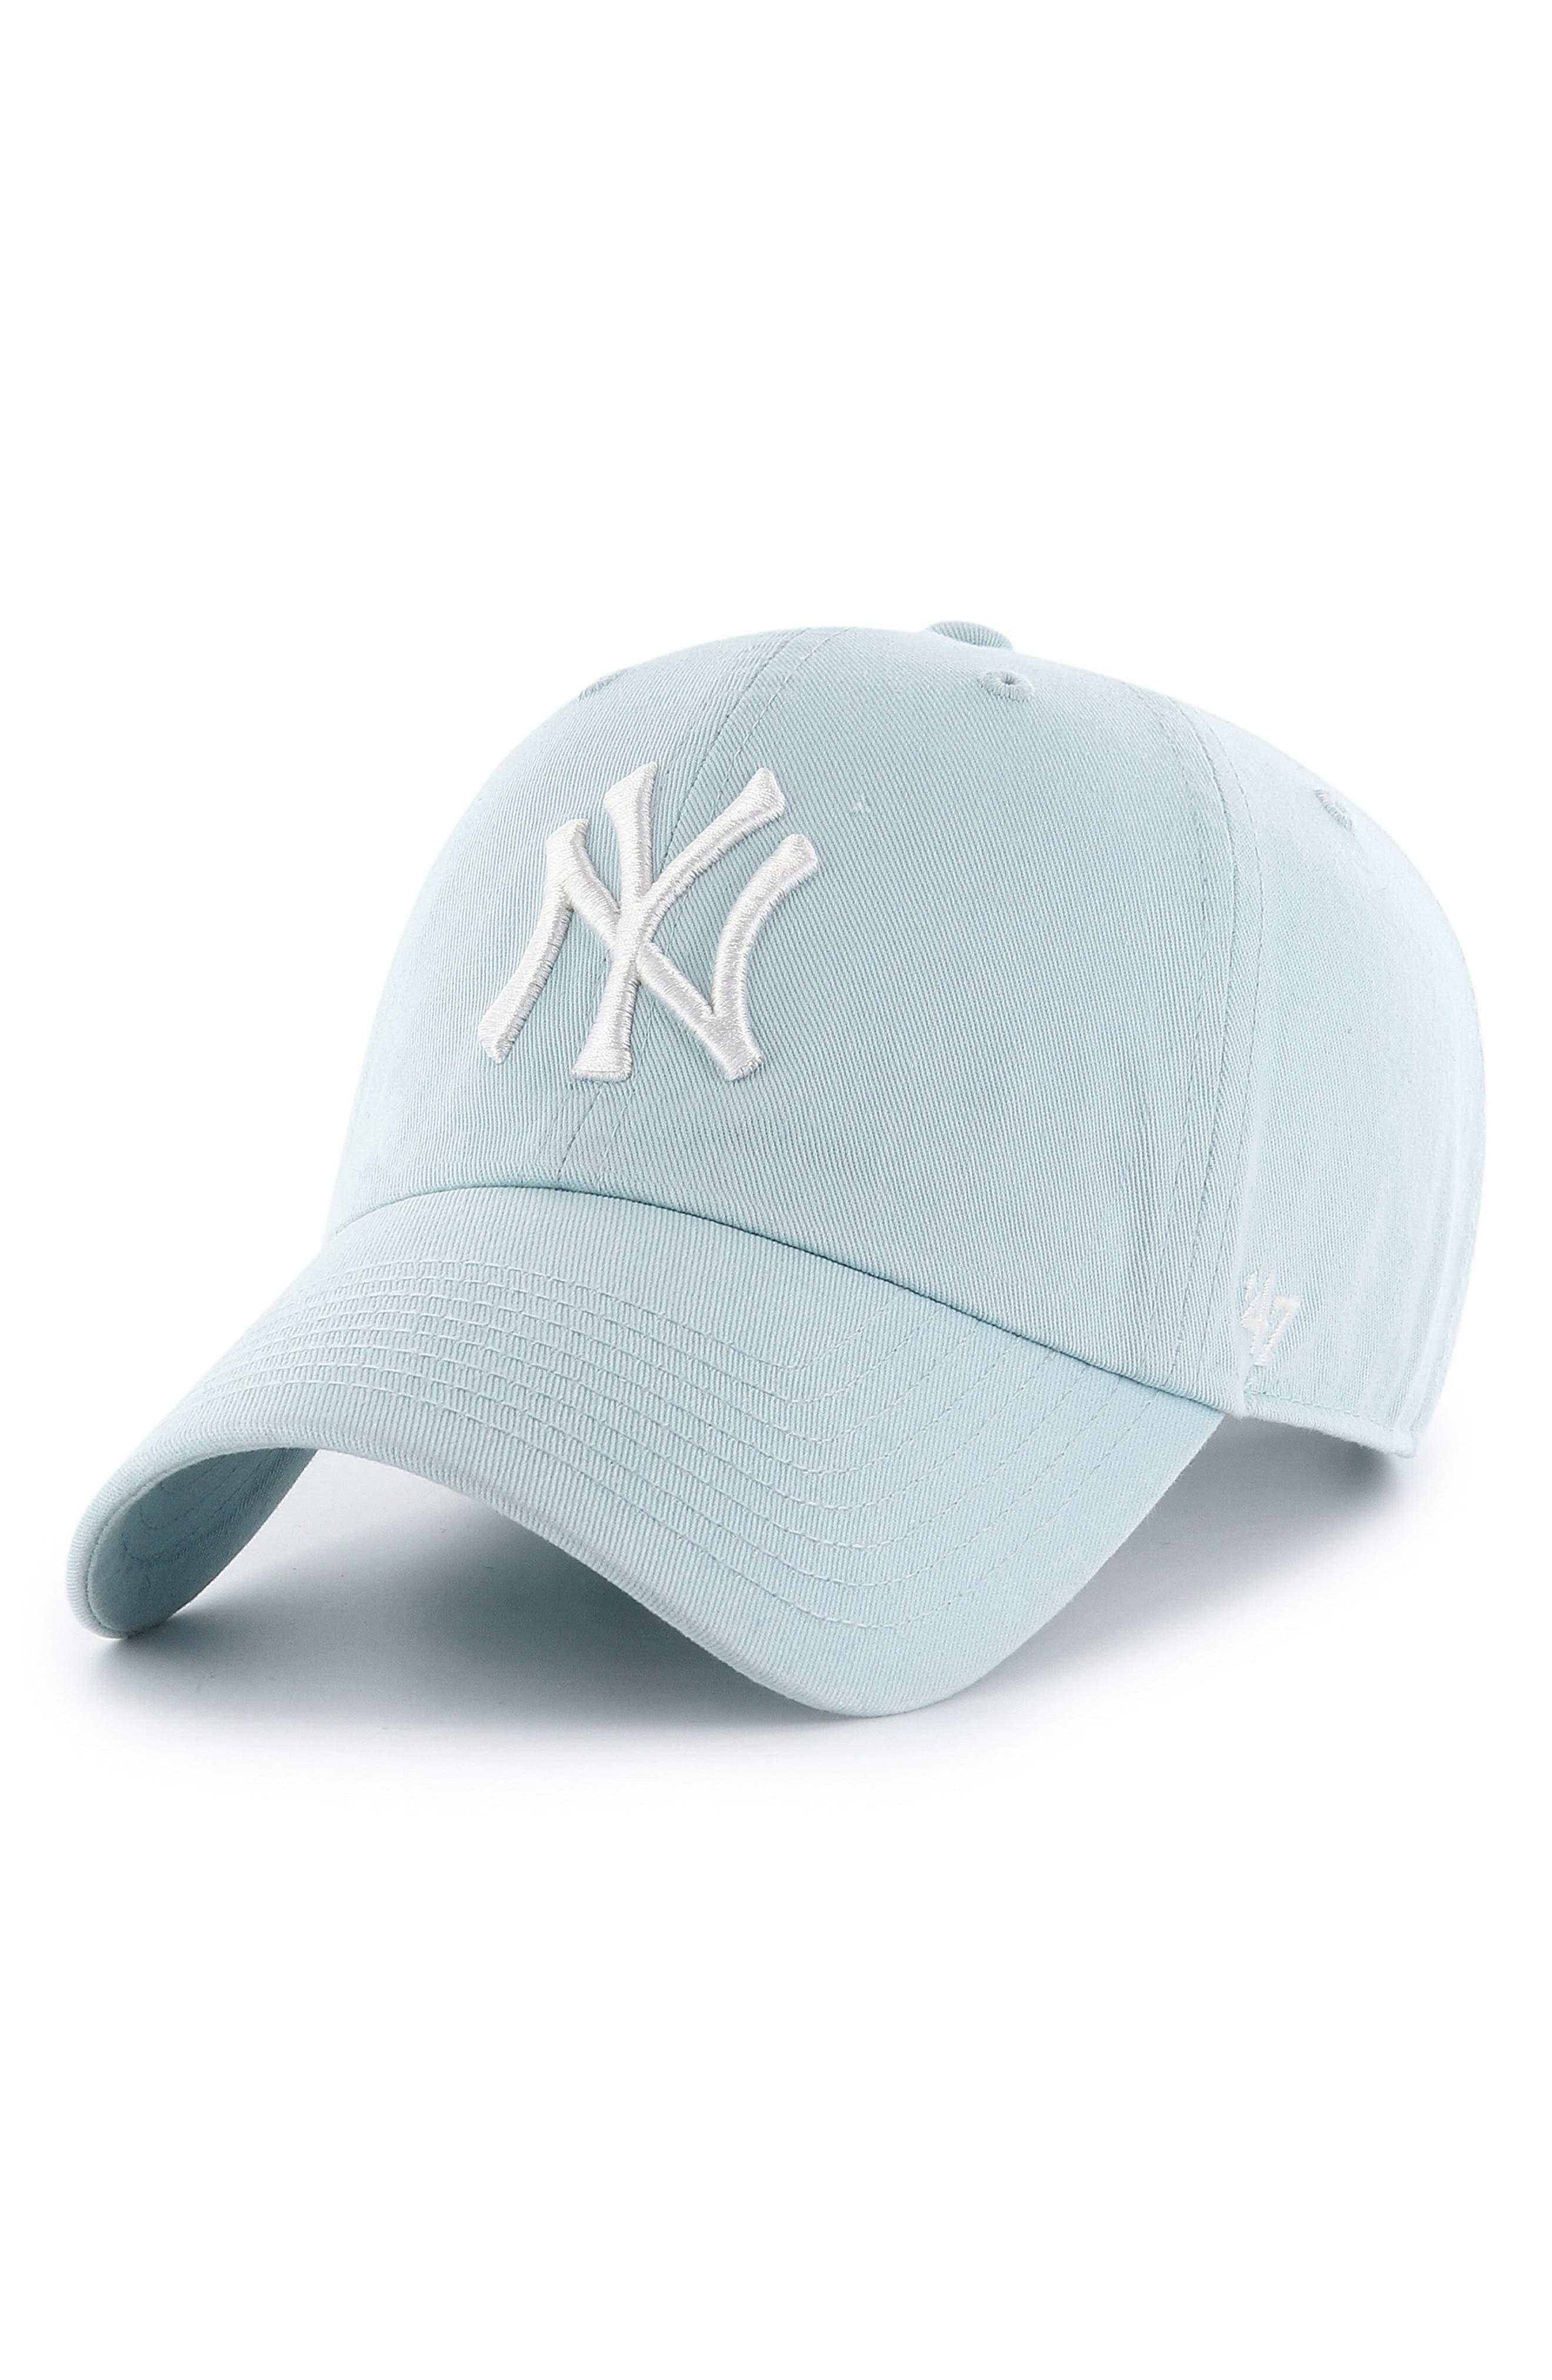 Main Image - '47 NY Yankees Baseball Cap